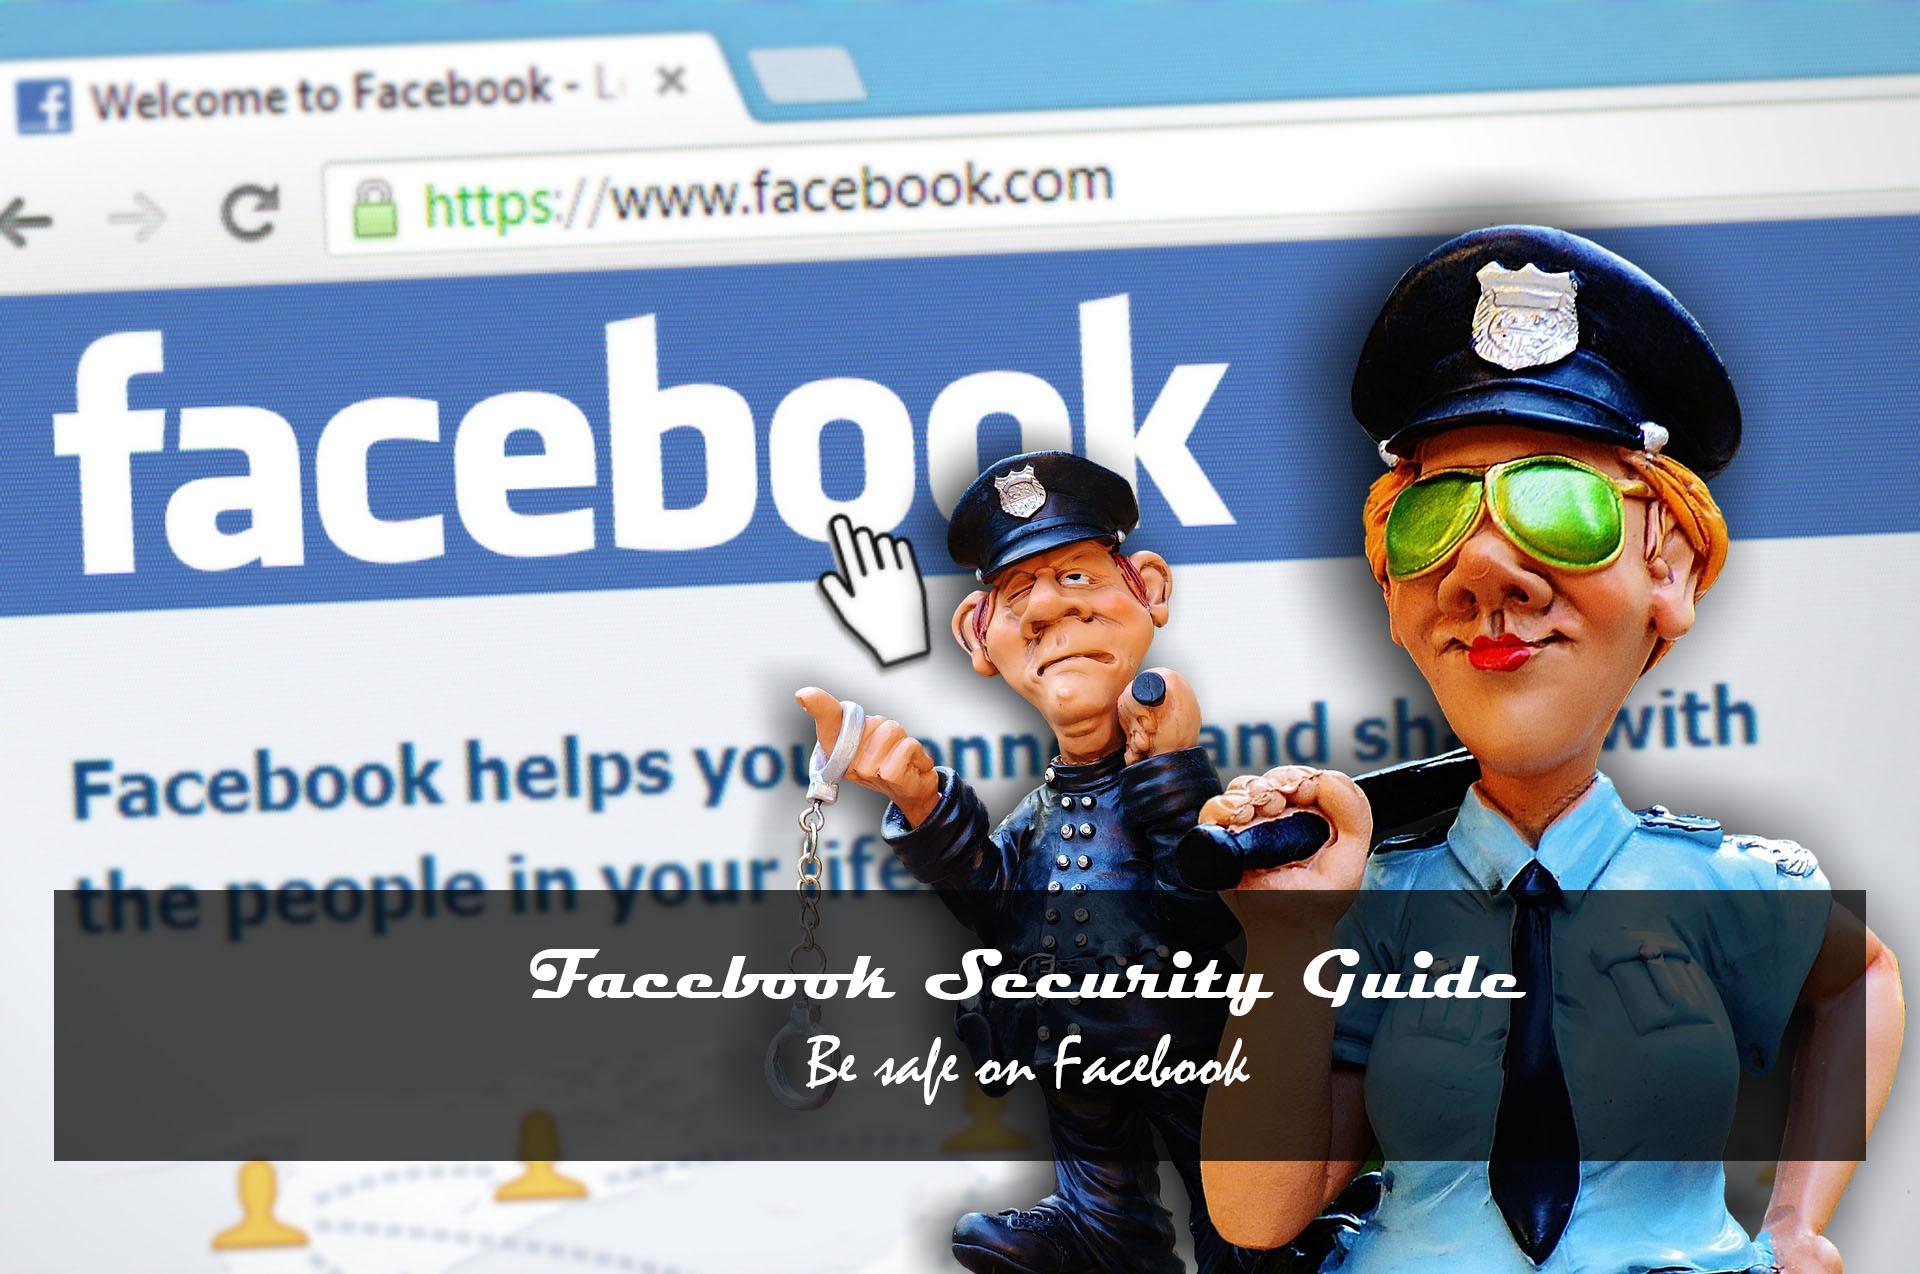 Facebook security Guide - Be safe on Facebook